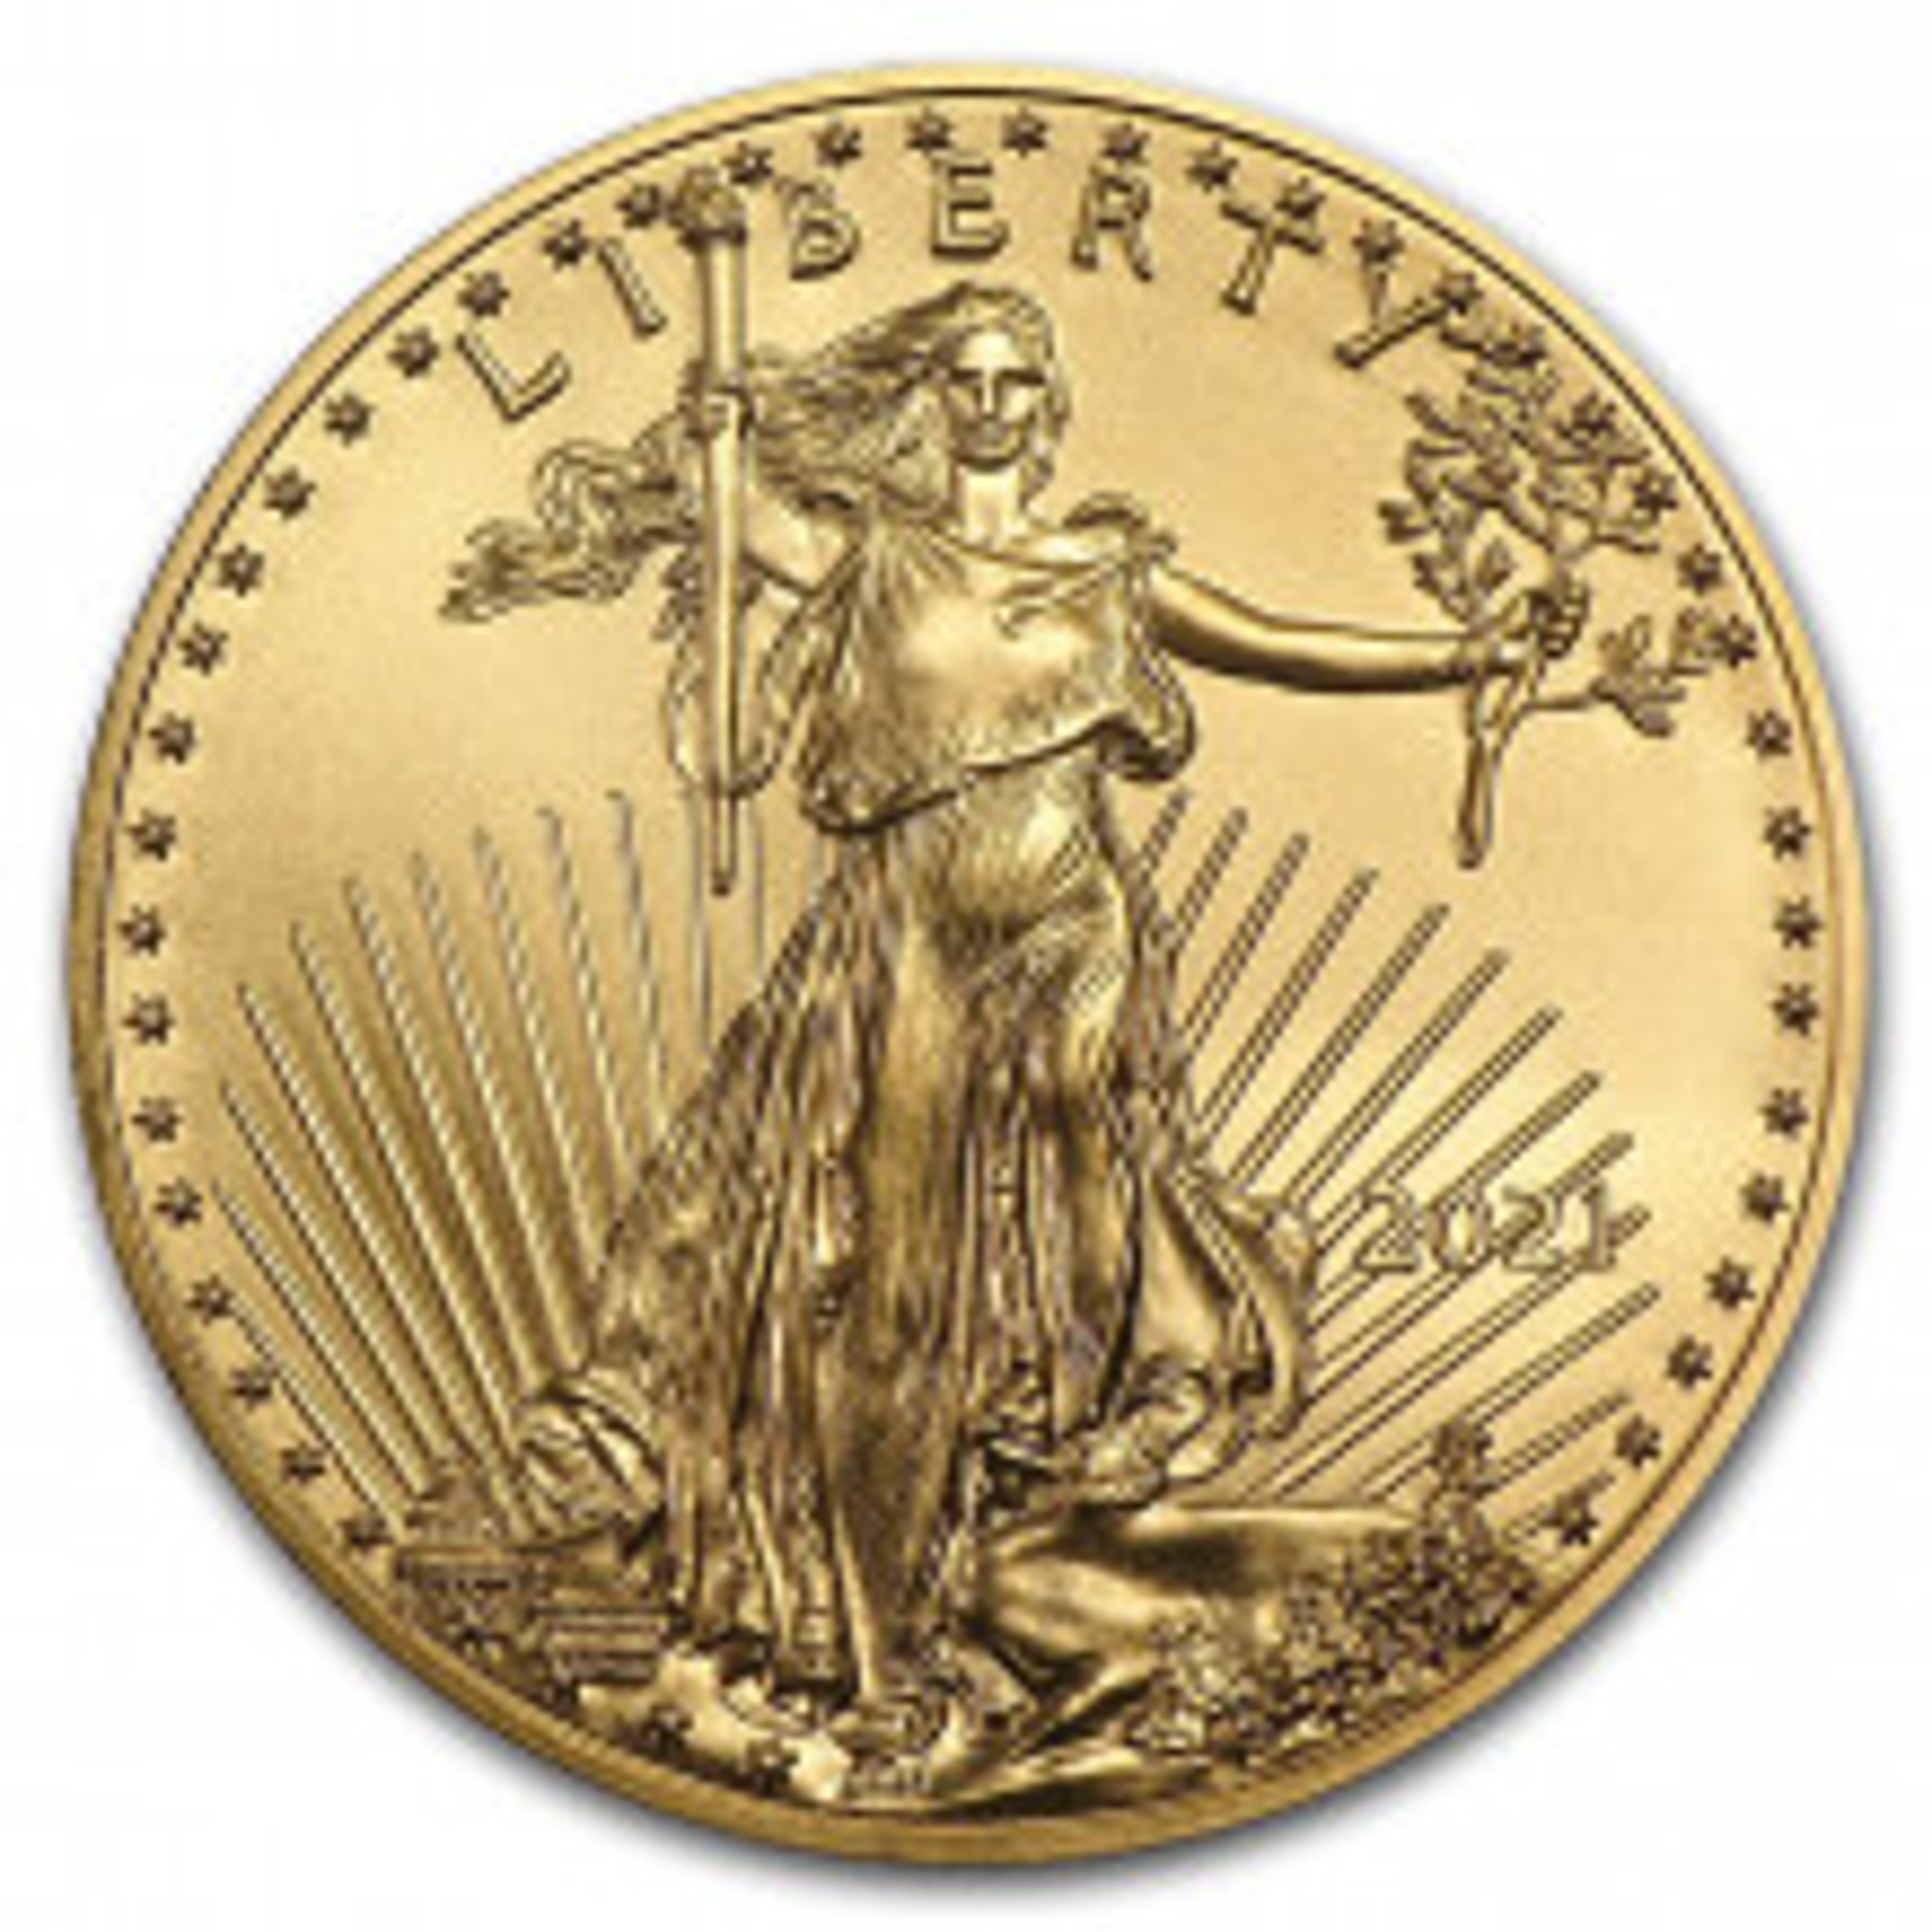 Gold Eagle 1/2 troy ounce coin 2021